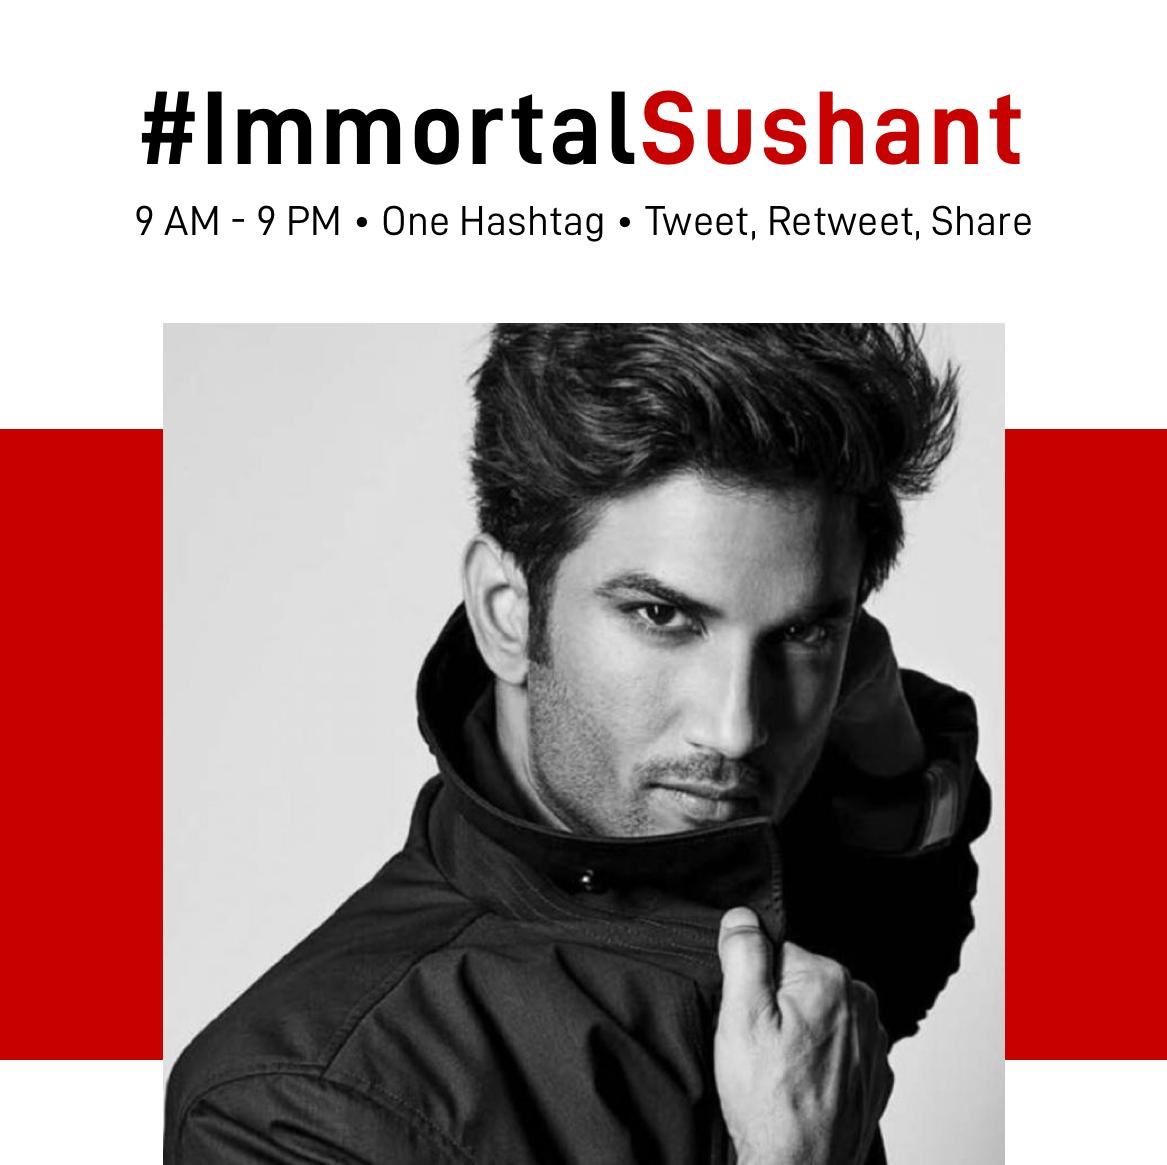 #ImmortalSushant